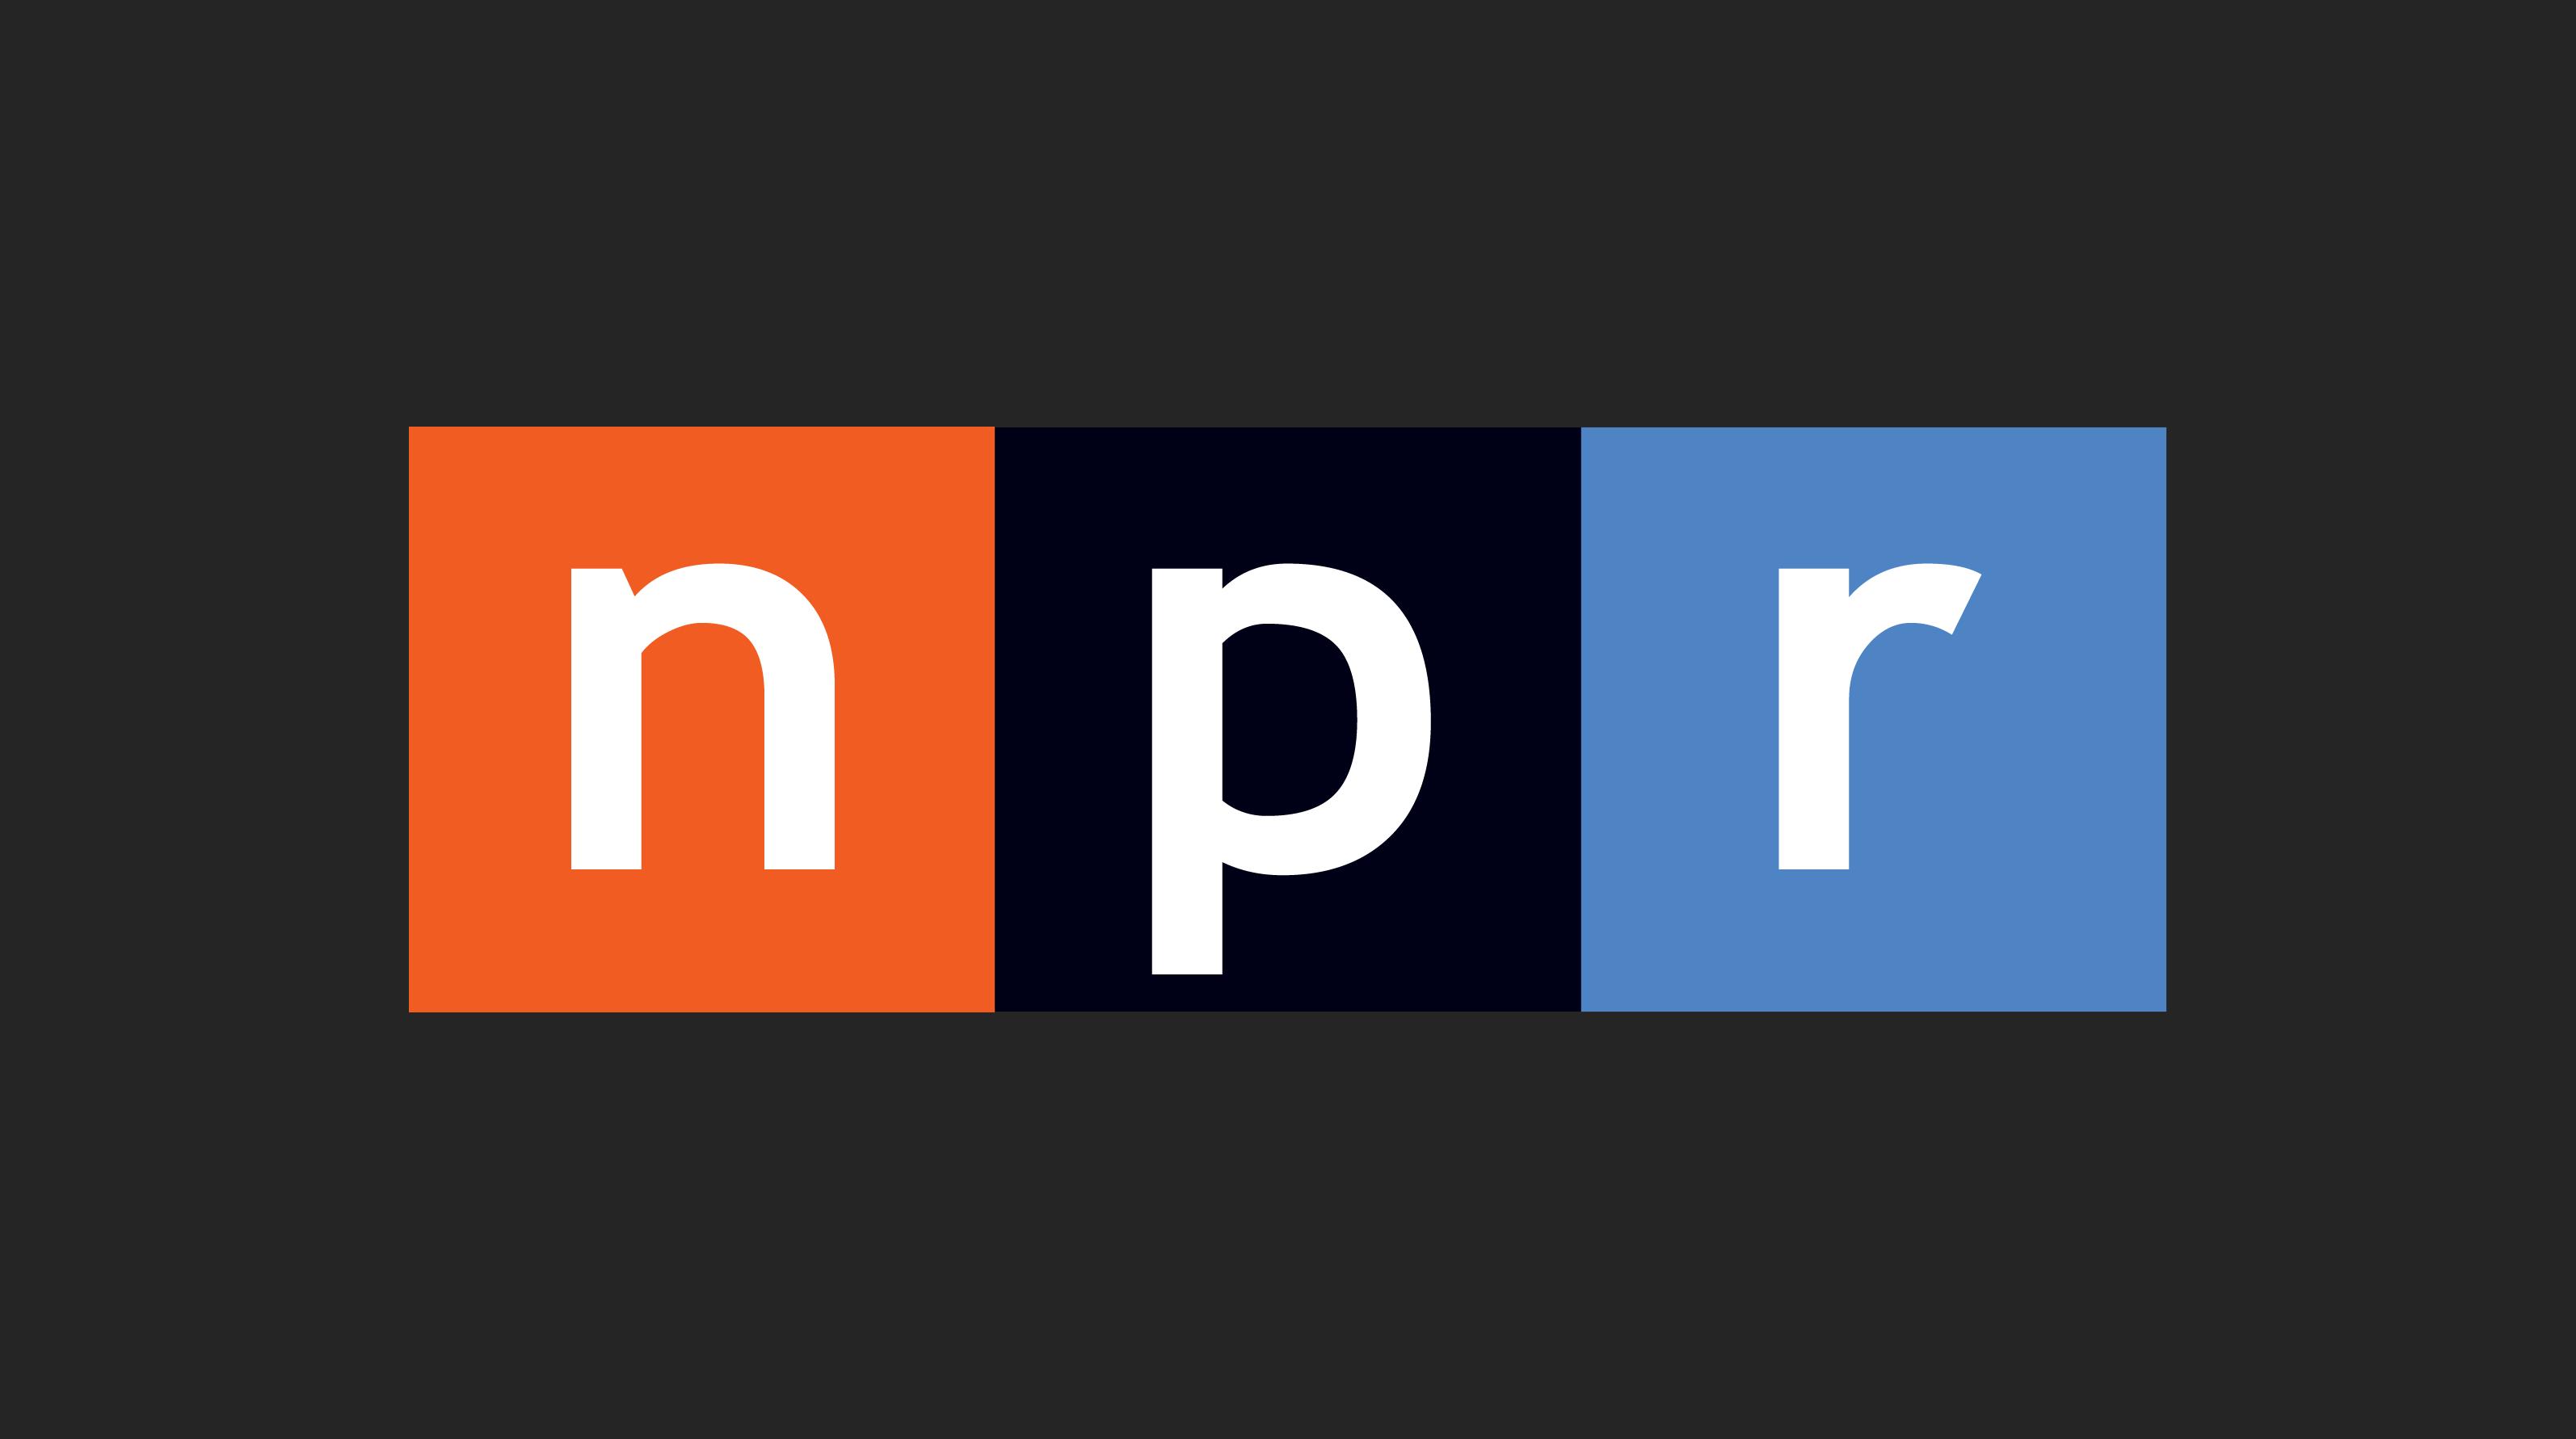 Amy Siskind speaks with NPR's Joshua Johnson